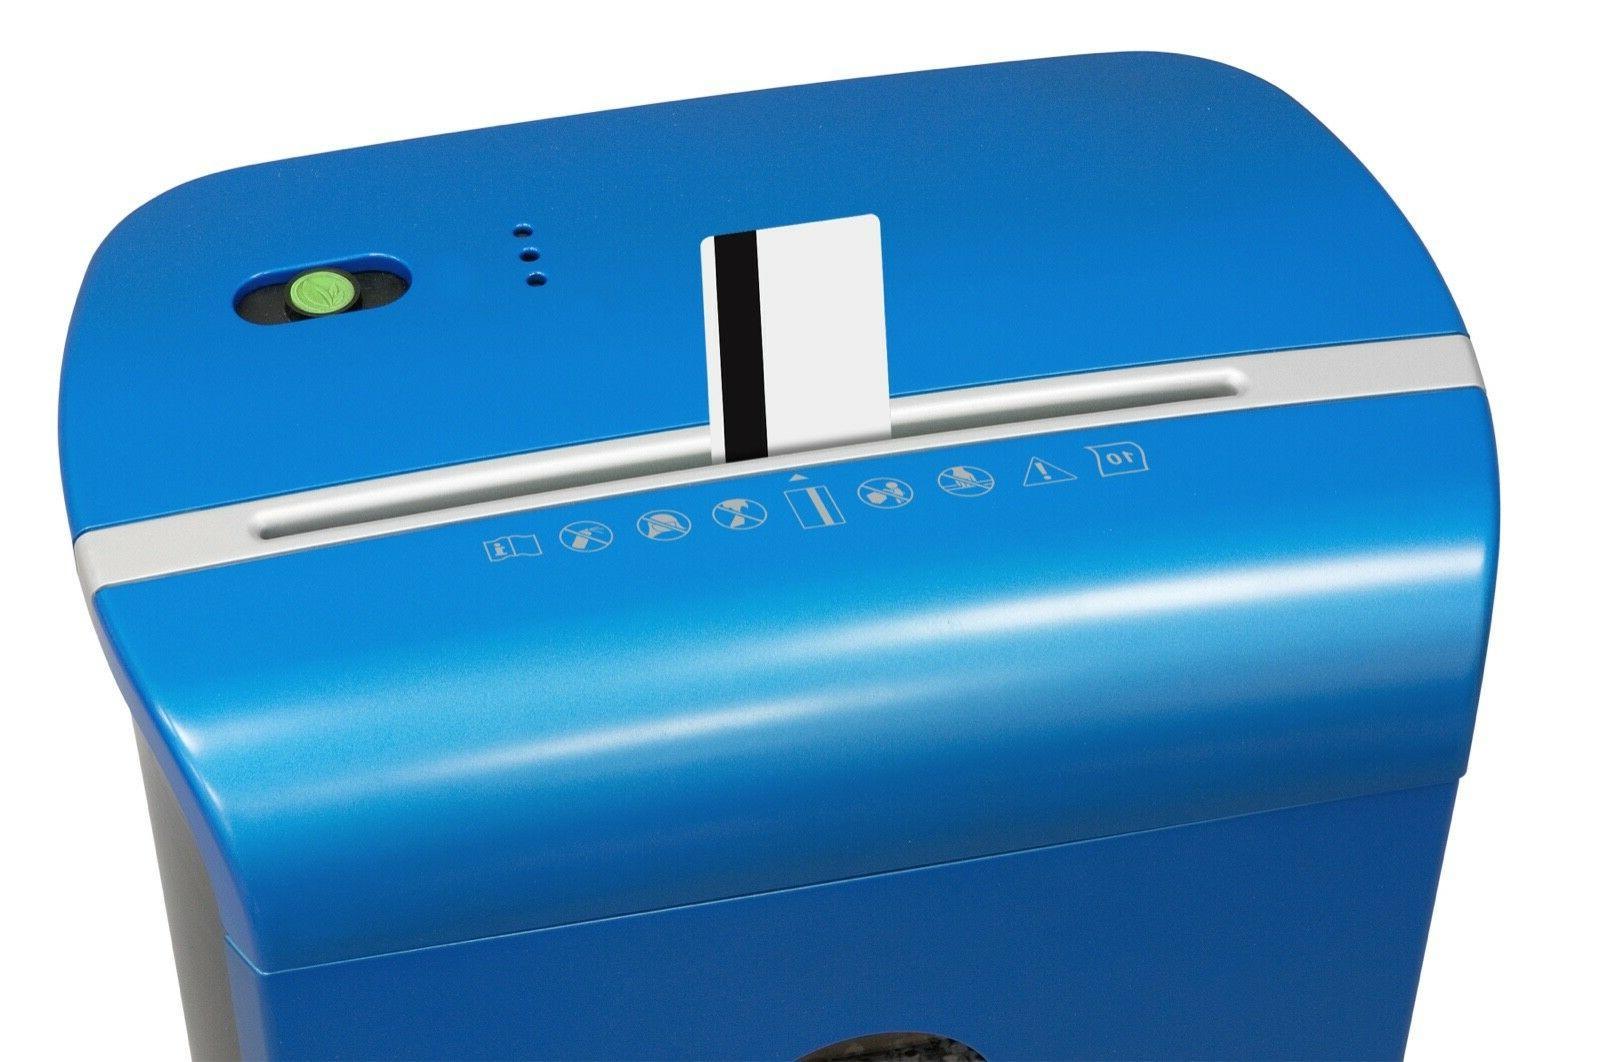 GoECOlife GMW104P-BLE 10 Microcut Shredder, Ultra Quiet, Metallic Blue